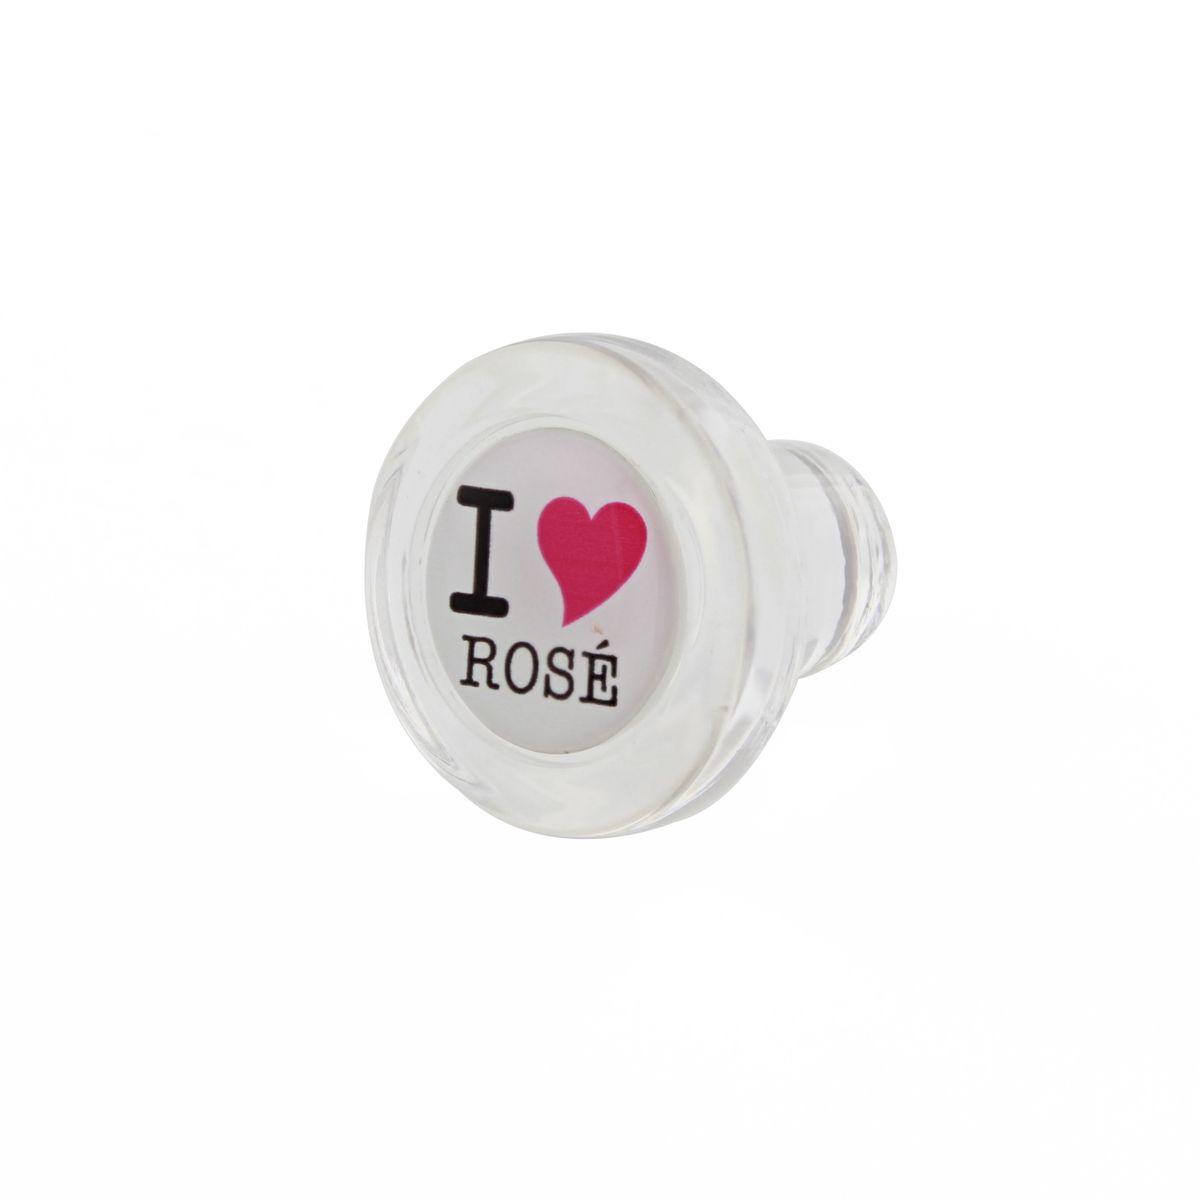 Bouchon en verre - Blanc -  I Love Rose - Cevenpack